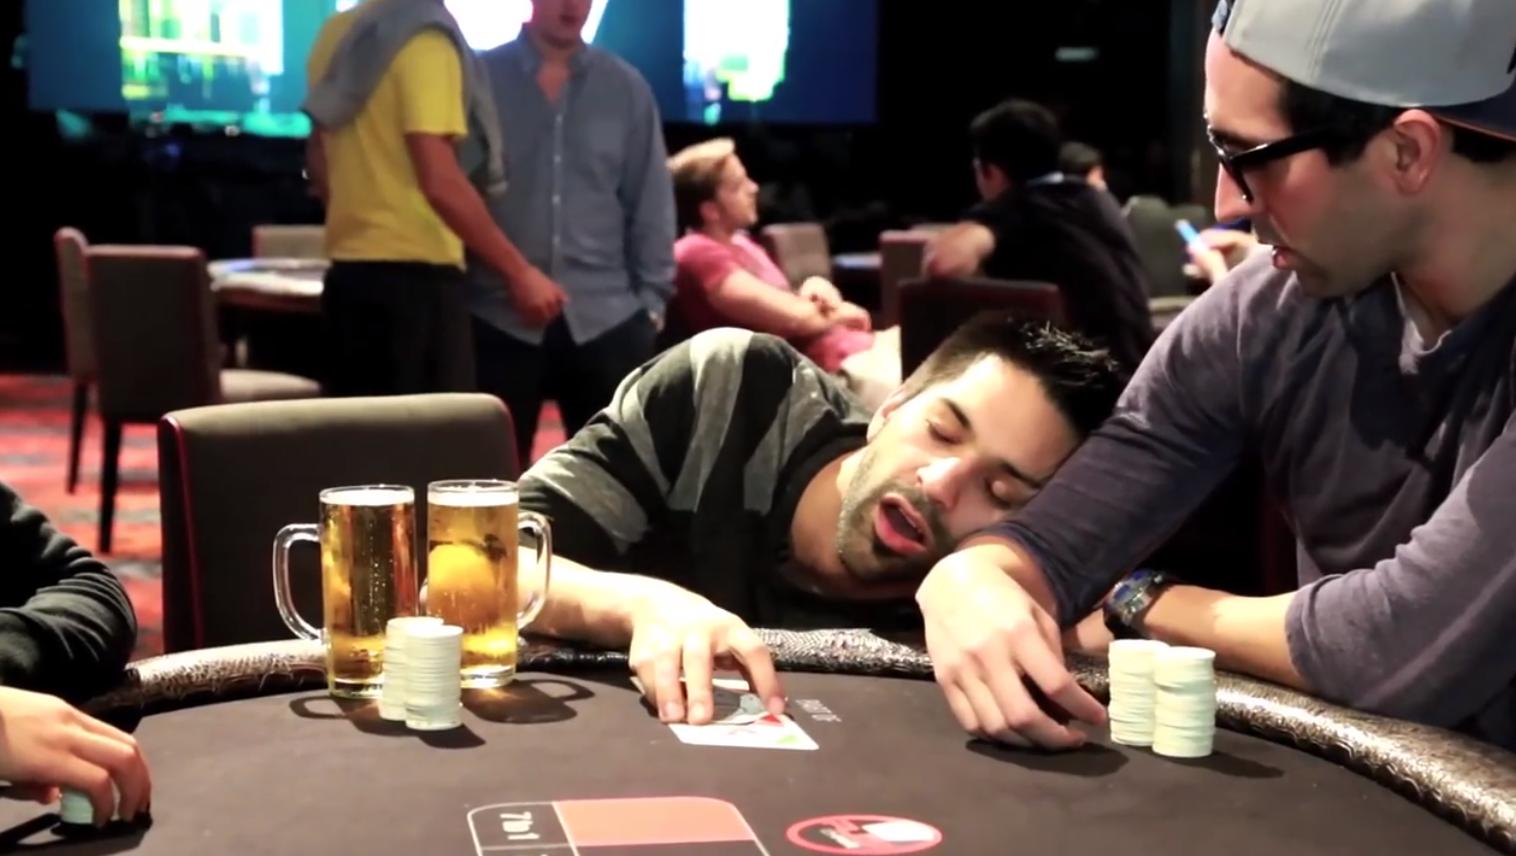 Gamblingonline with slartidbartfast wisconsin appleton legal gambling